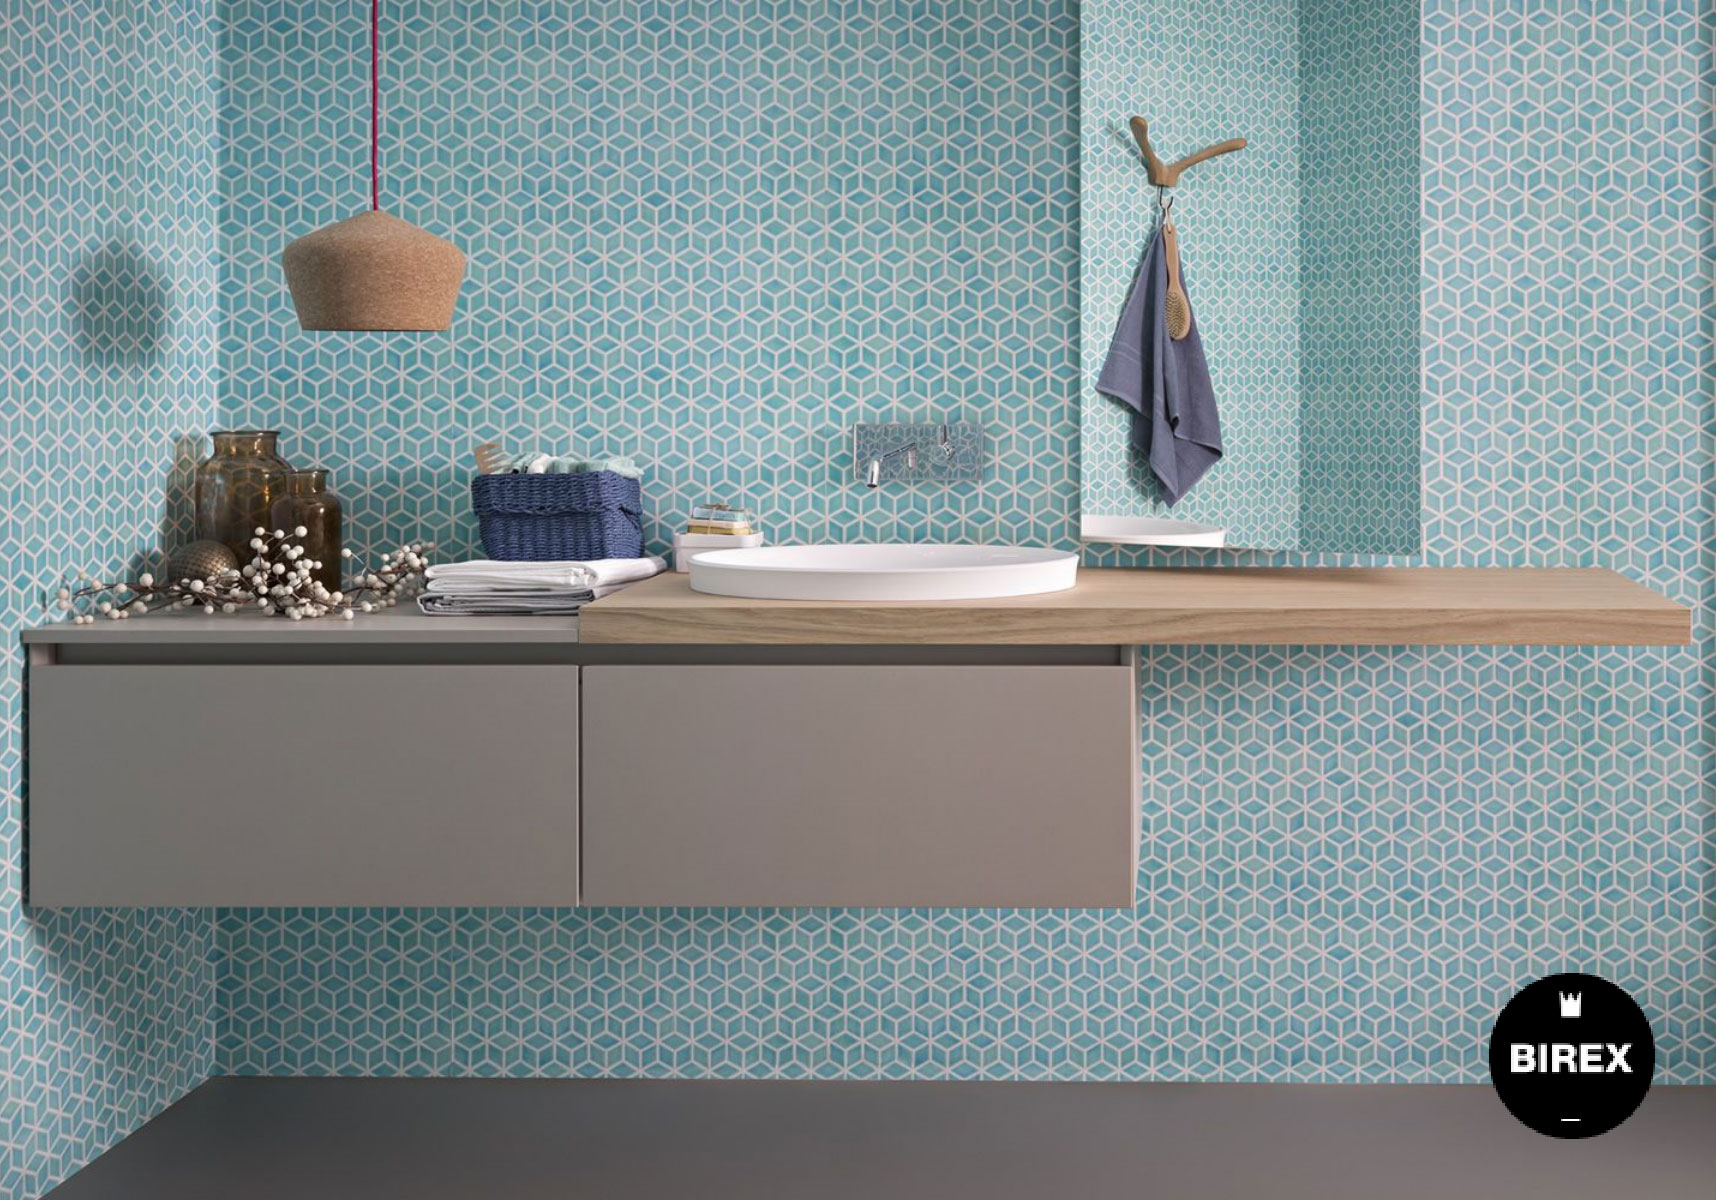 Bathroom furniture - Birex